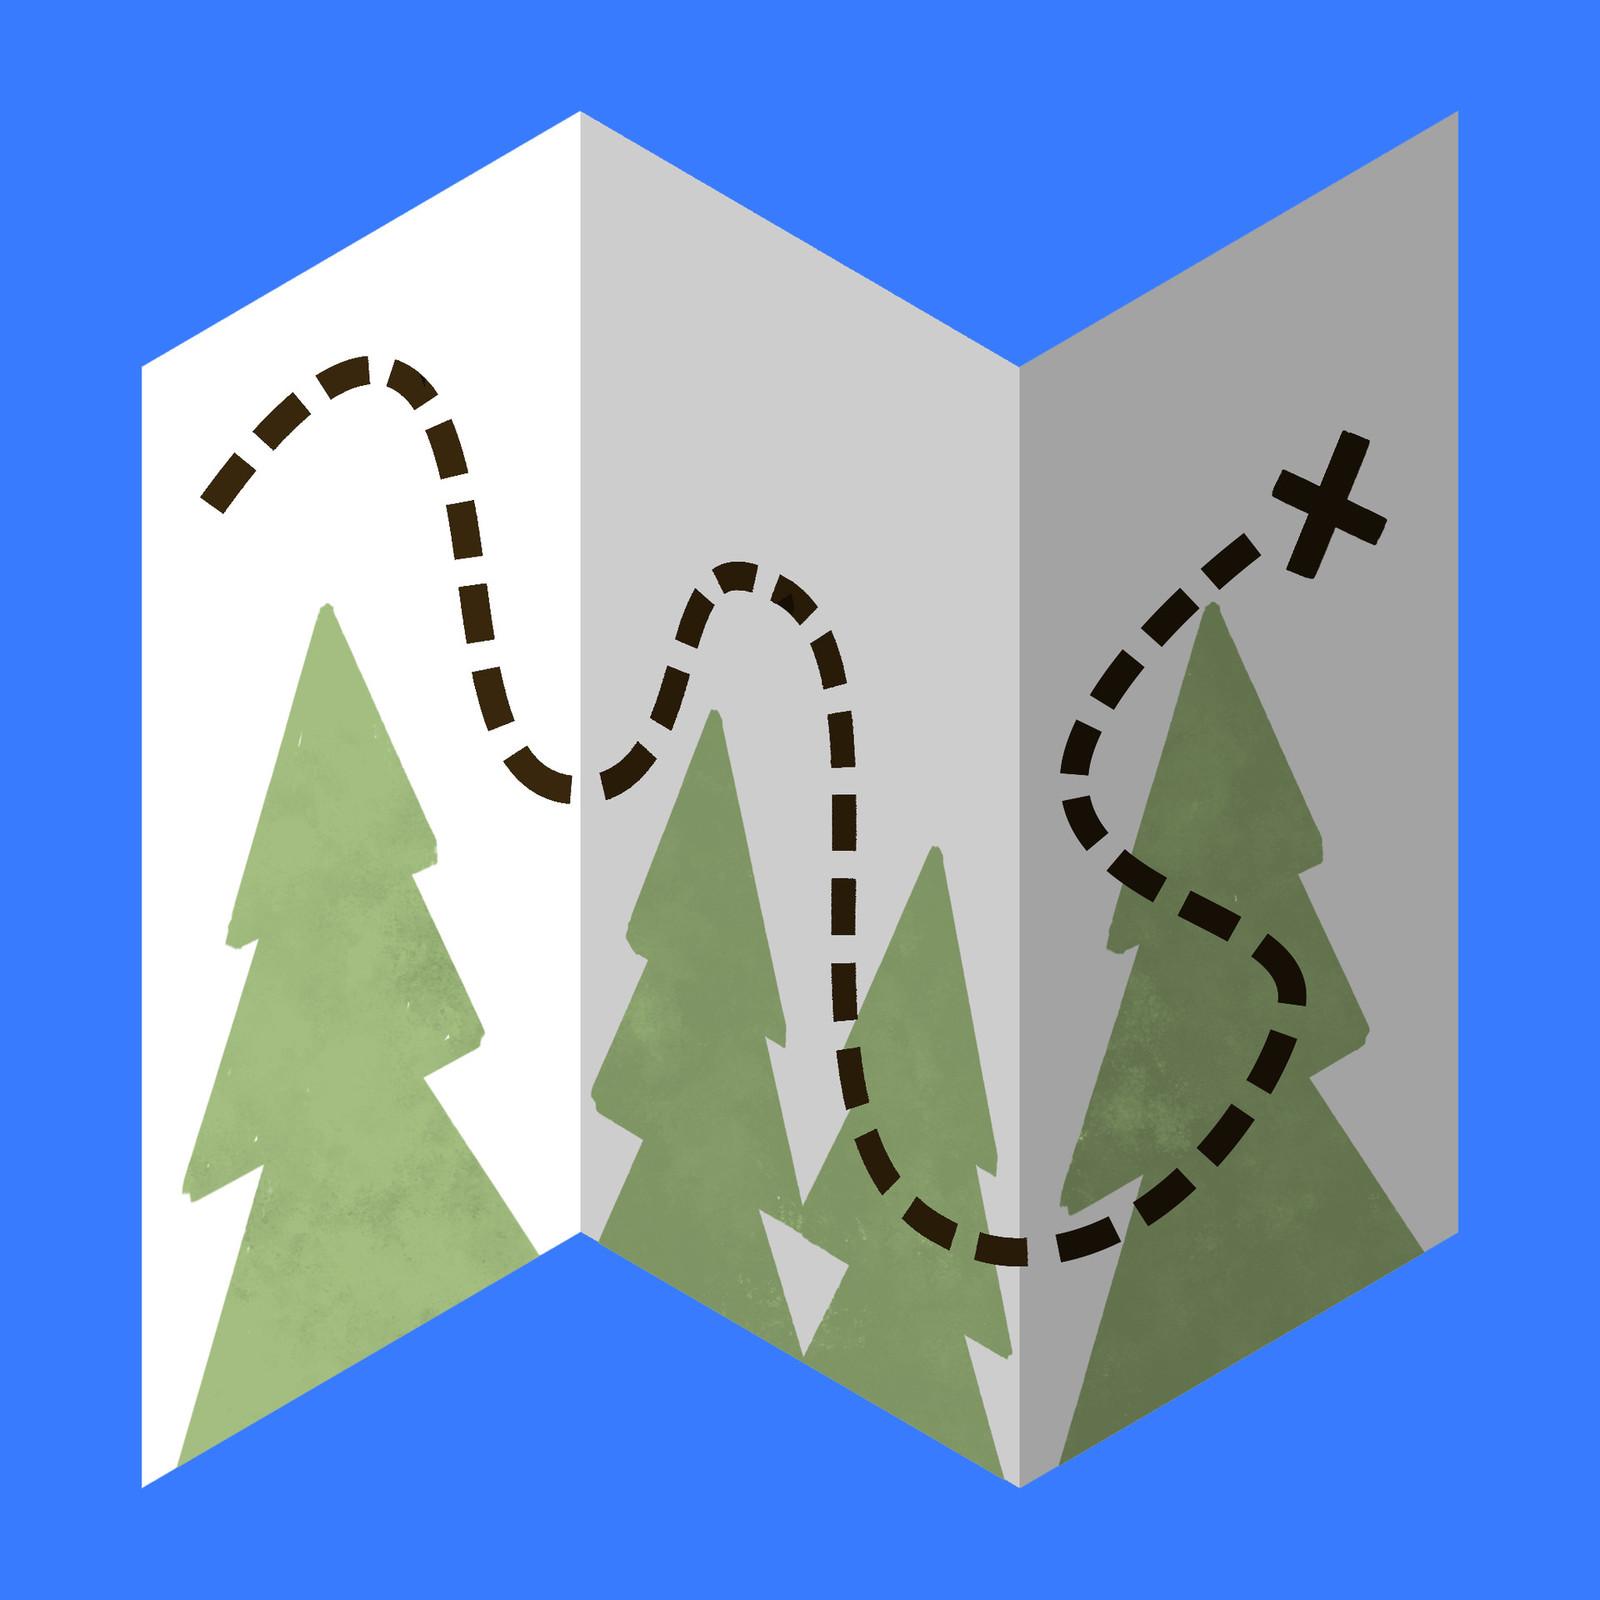 Alternate Mapr App Icon